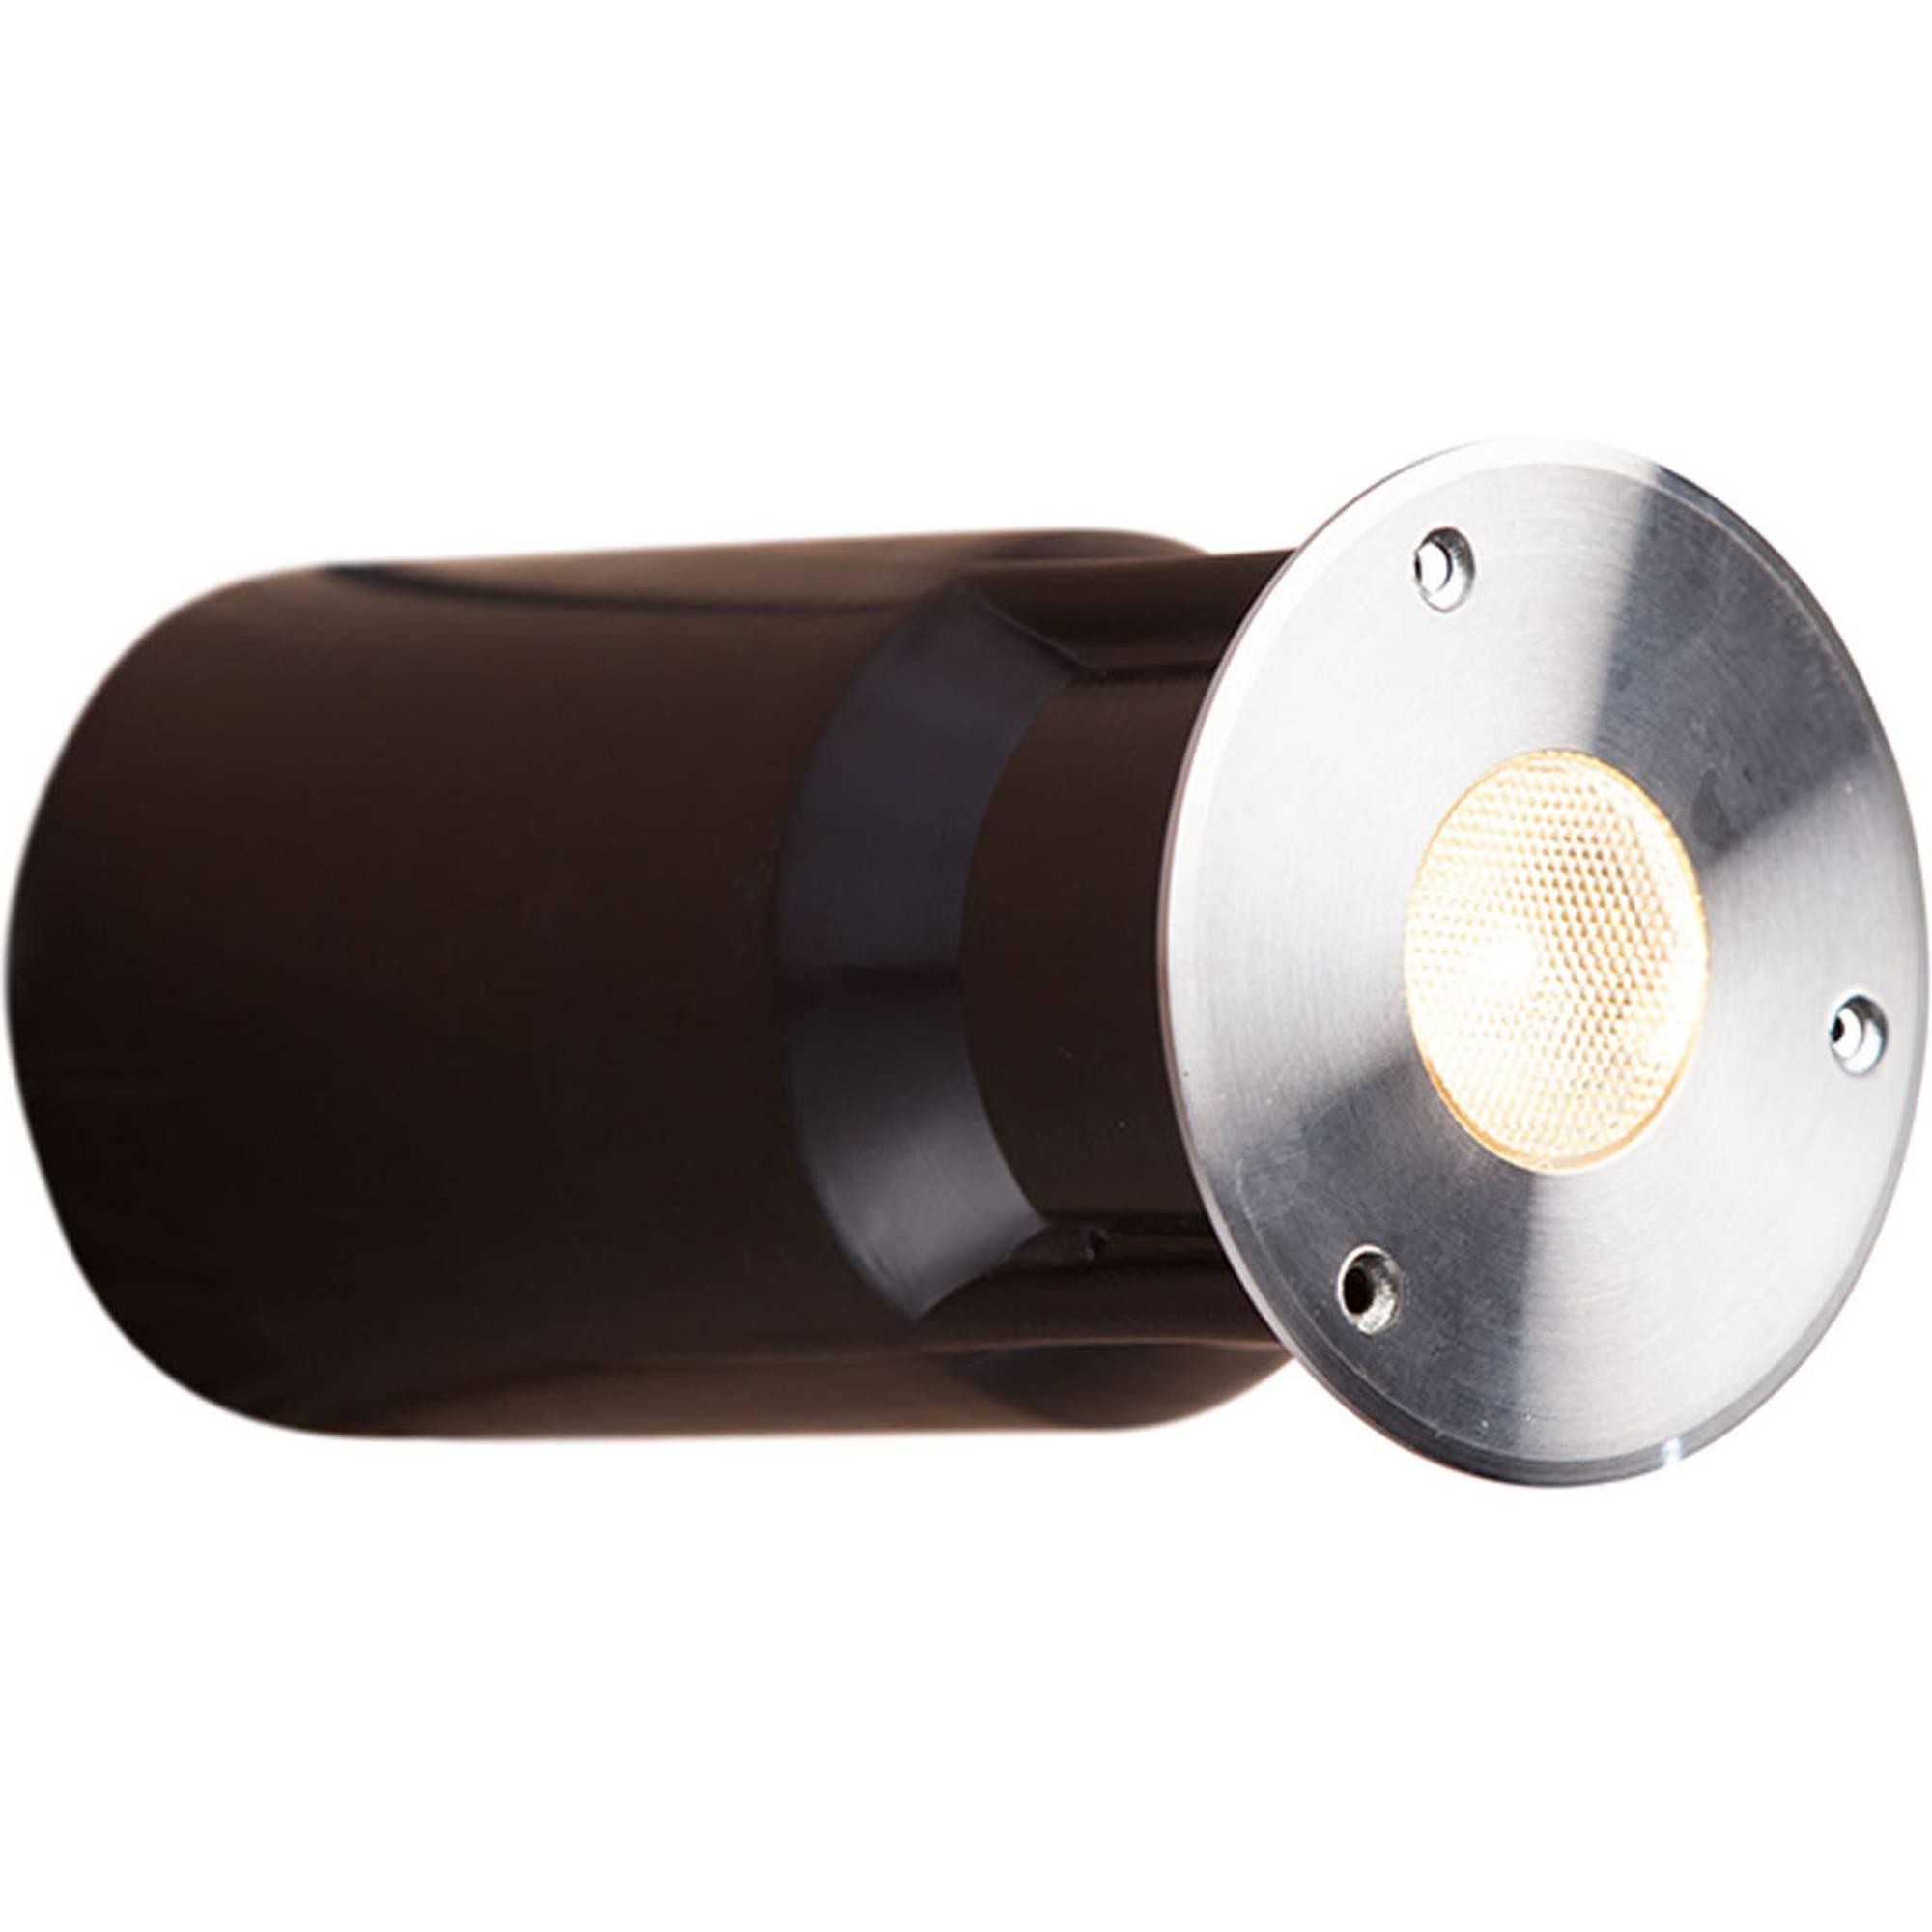 Heissner L453-00 Smart Light Bodeneinbau Spot und Decklight 3 Watt silber